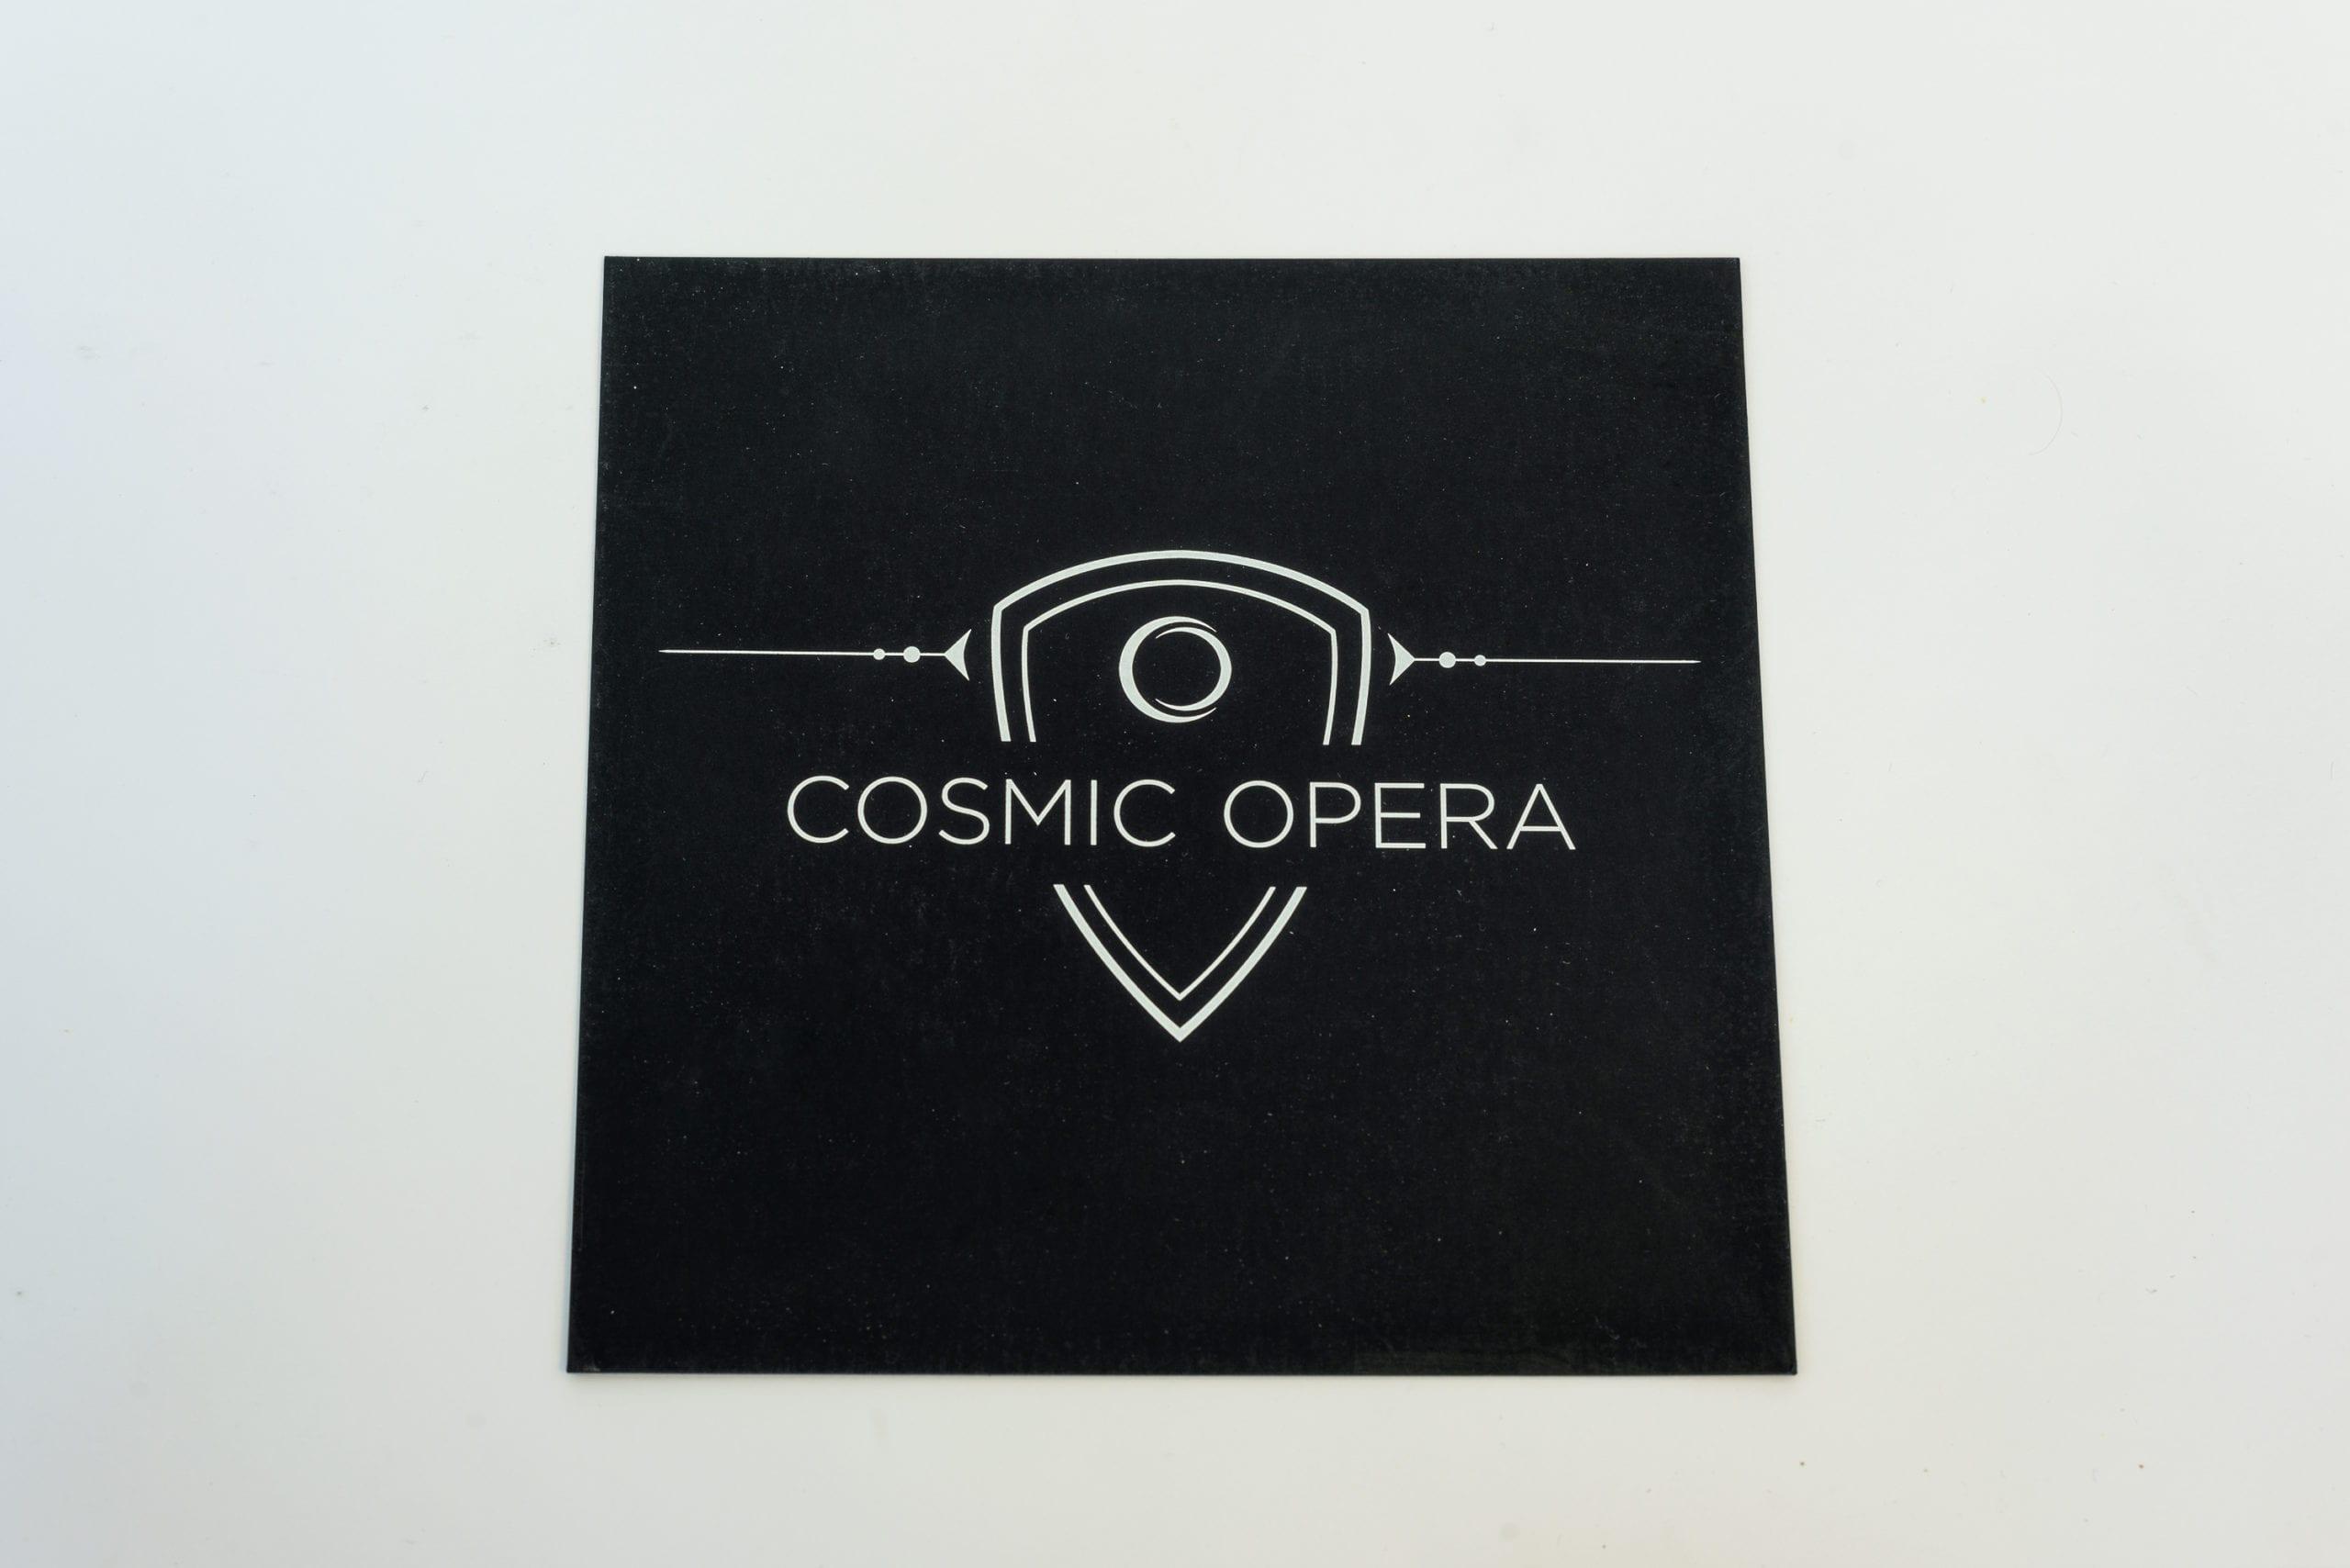 Cosmic Opera